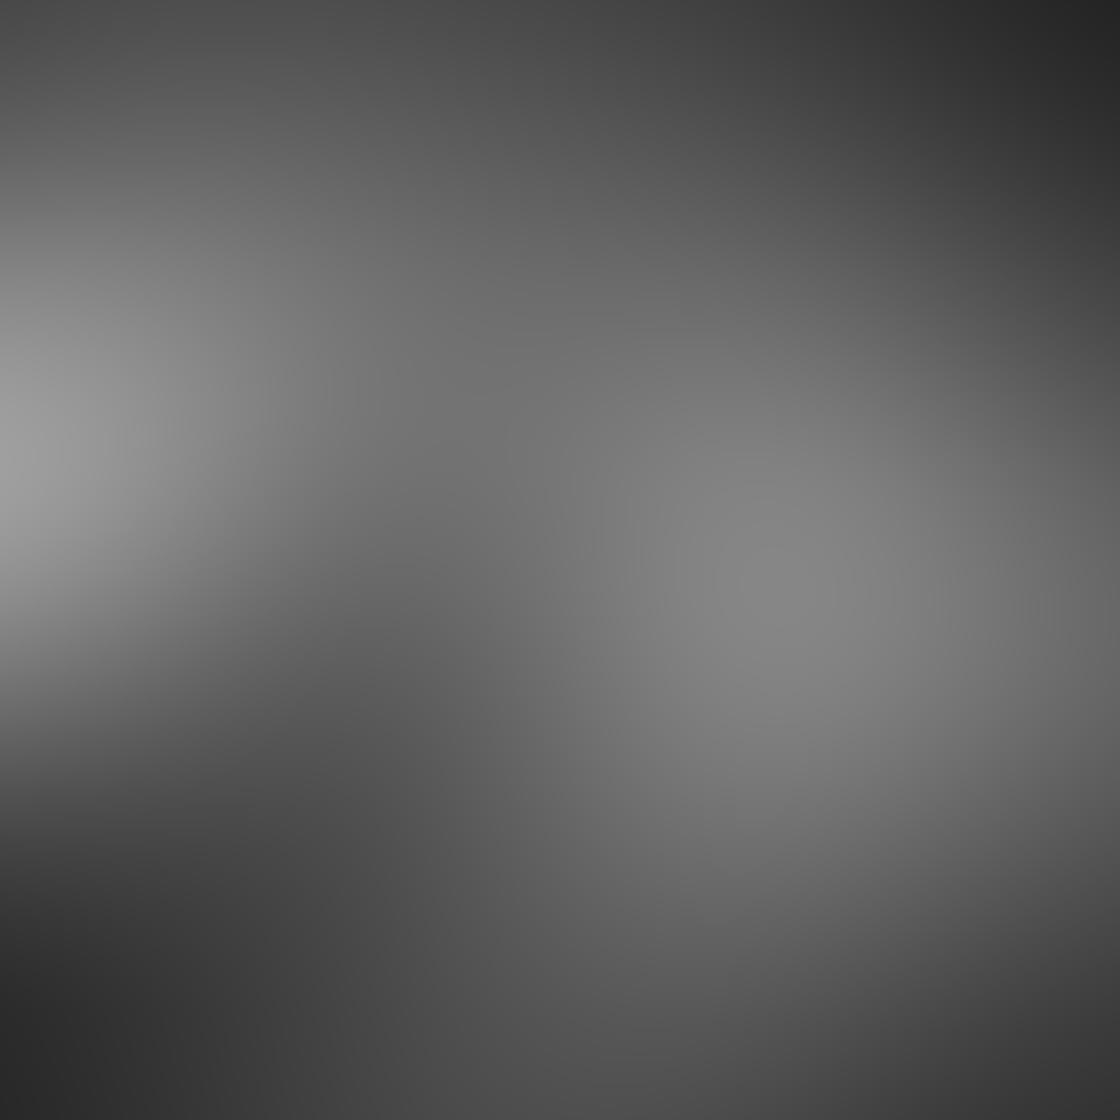 iPhone Photos Negative Space 26